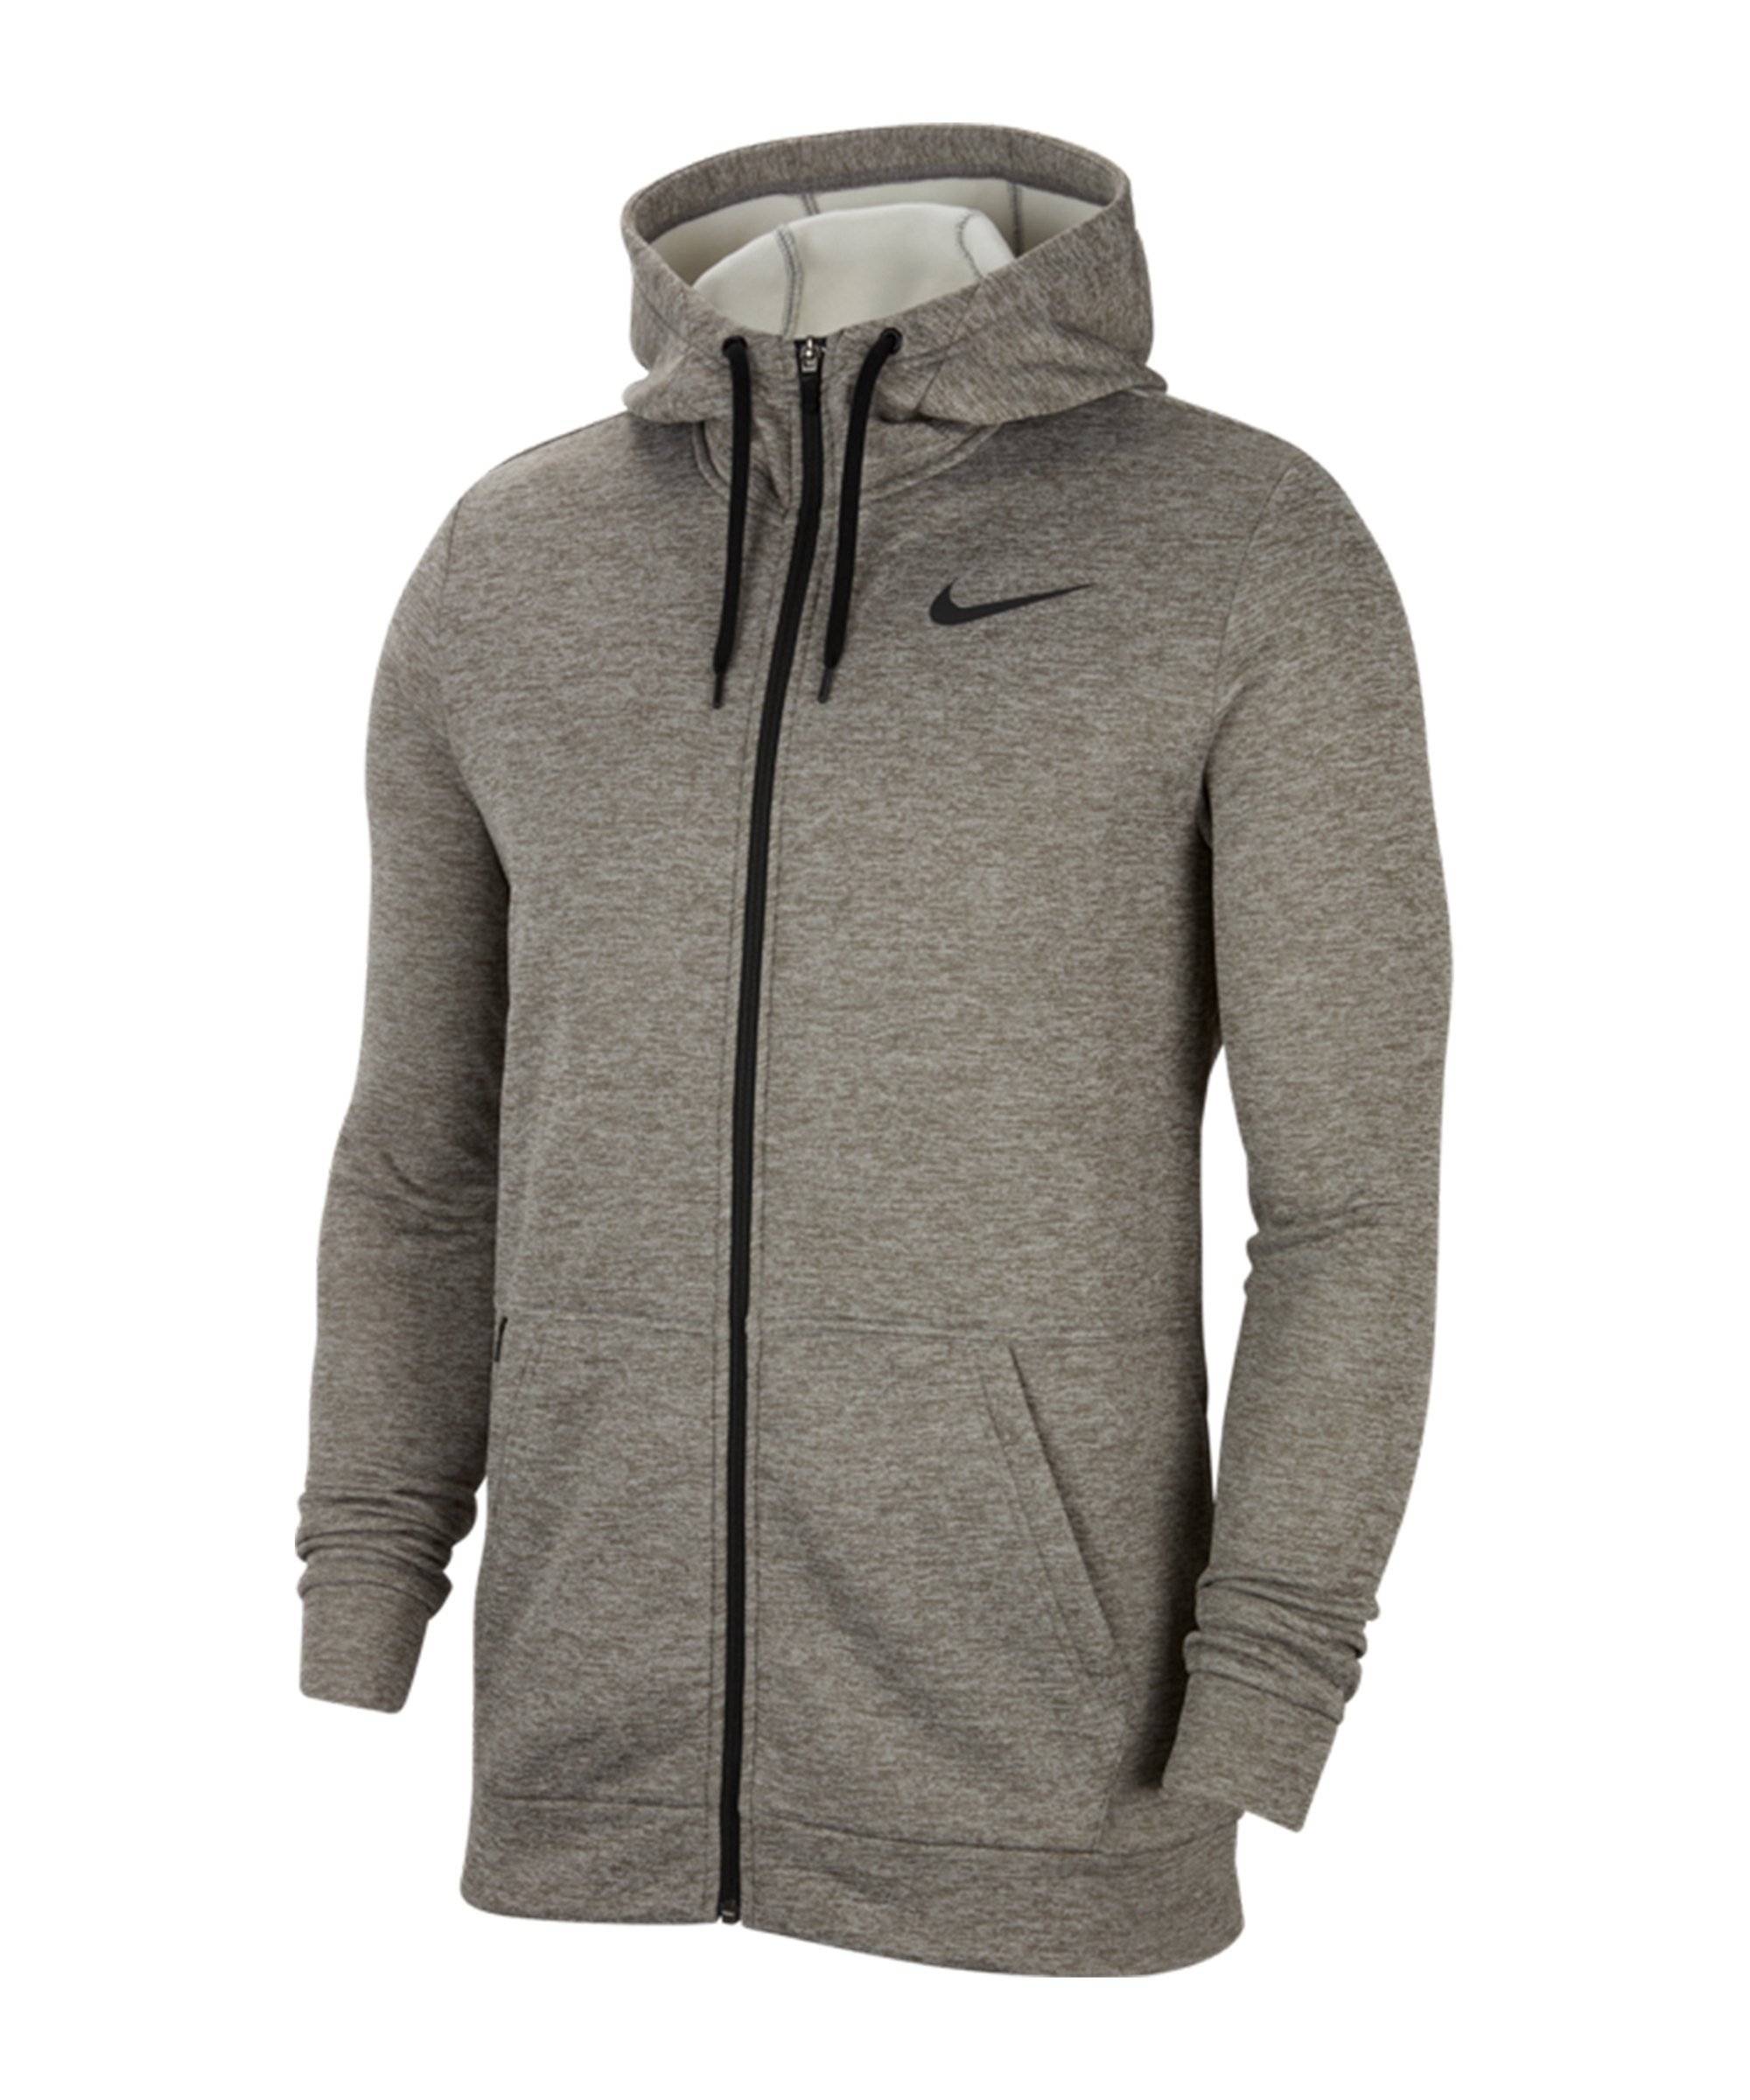 Nike Therma Kapuzenjacke Grau F063 - grau